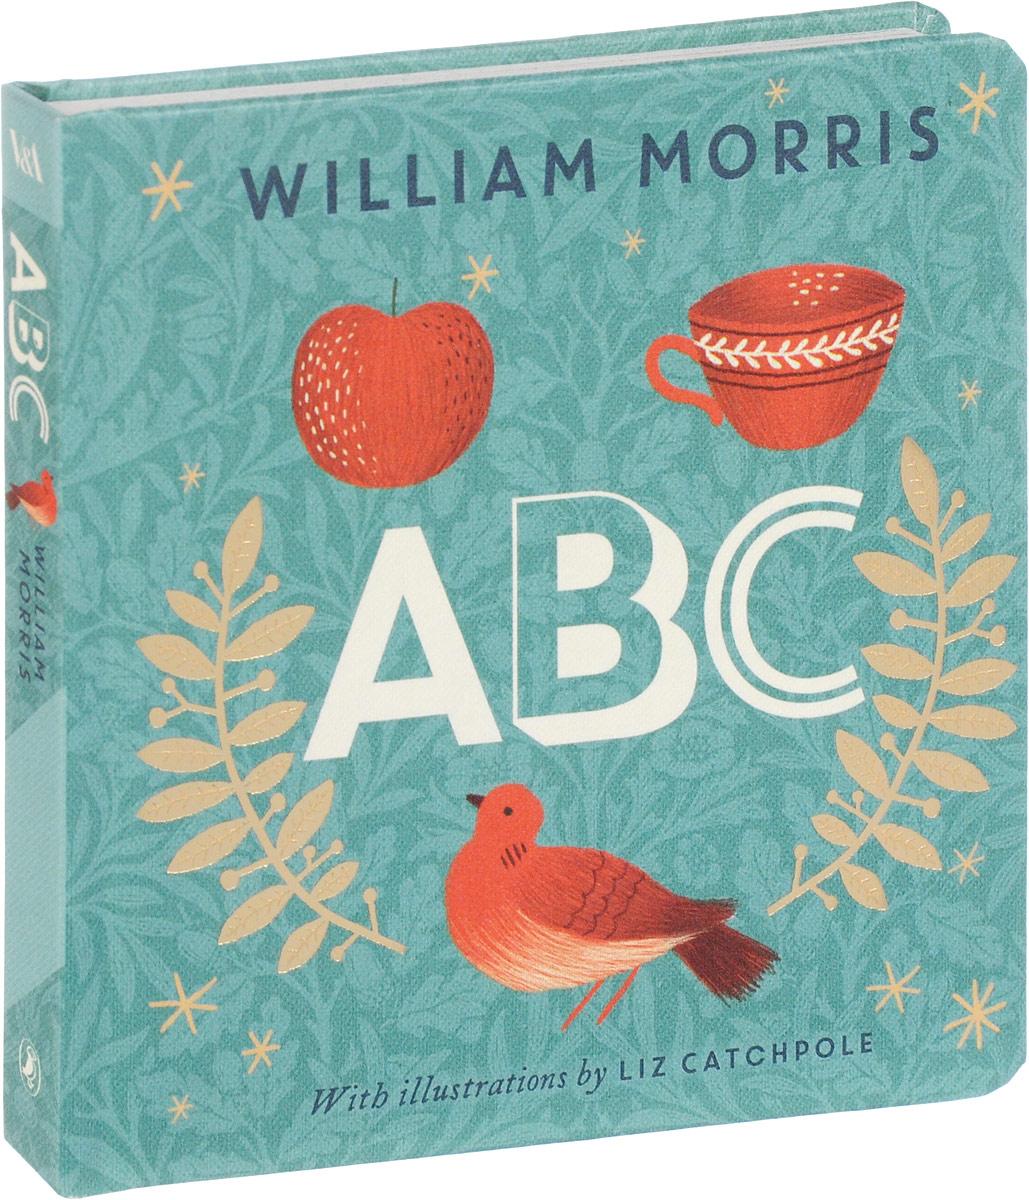 William Morris ABC ben morris introduction to bada a developer s guide